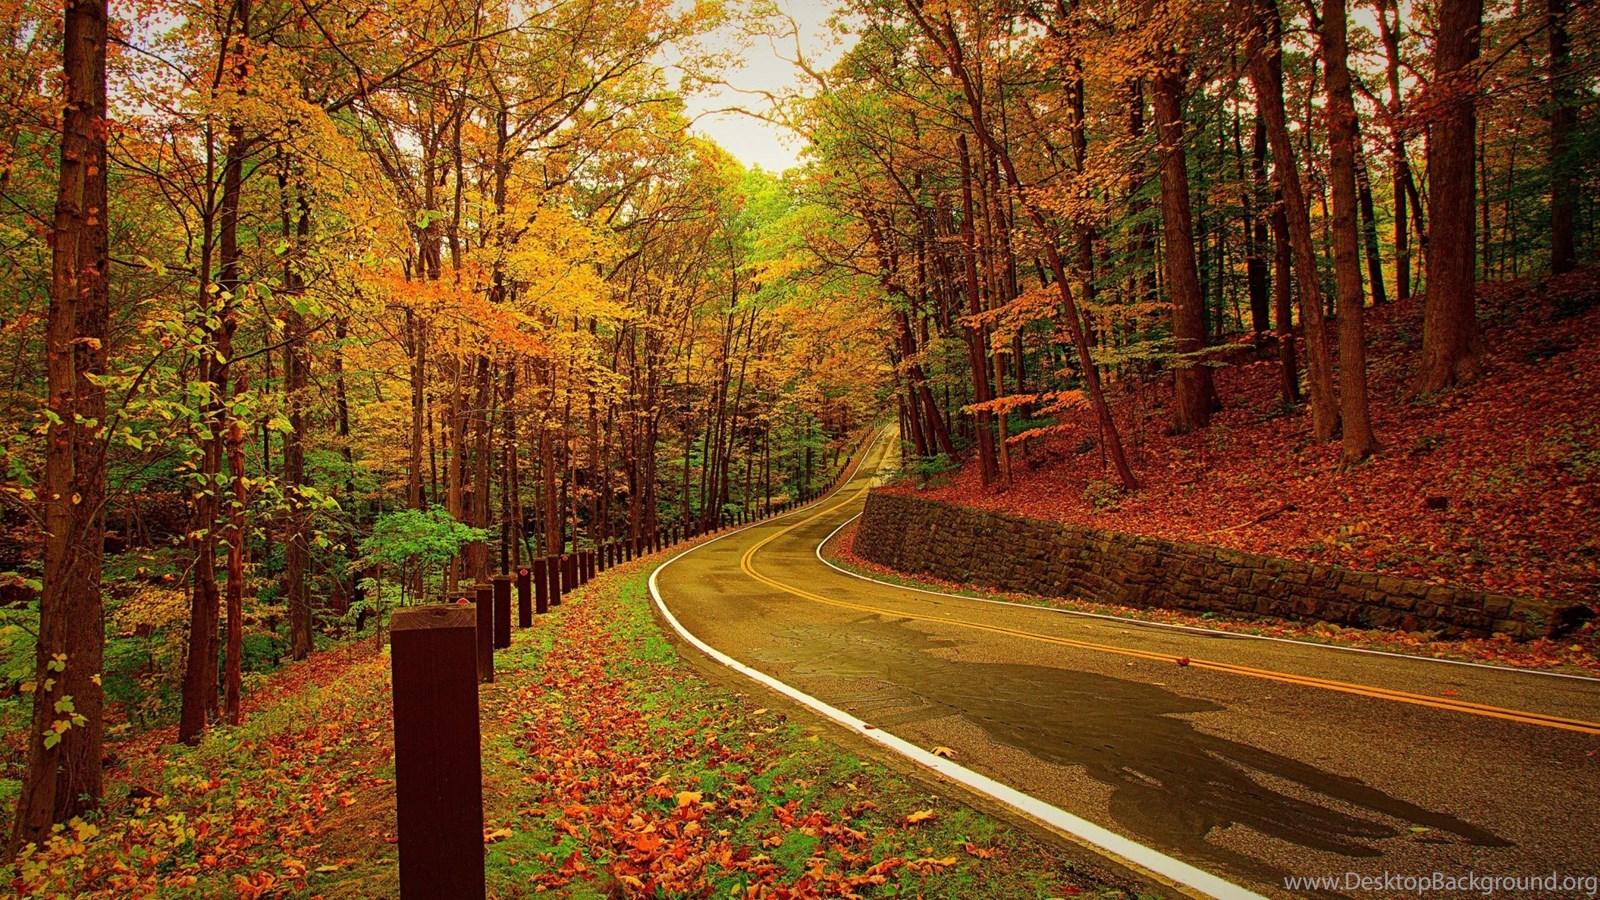 Hd Wallpapers 1080p Wallpapers Full Hd 1080p 1920x1080: Full HD 1080p Autumn Wallpapers HD, Desktop Backgrounds